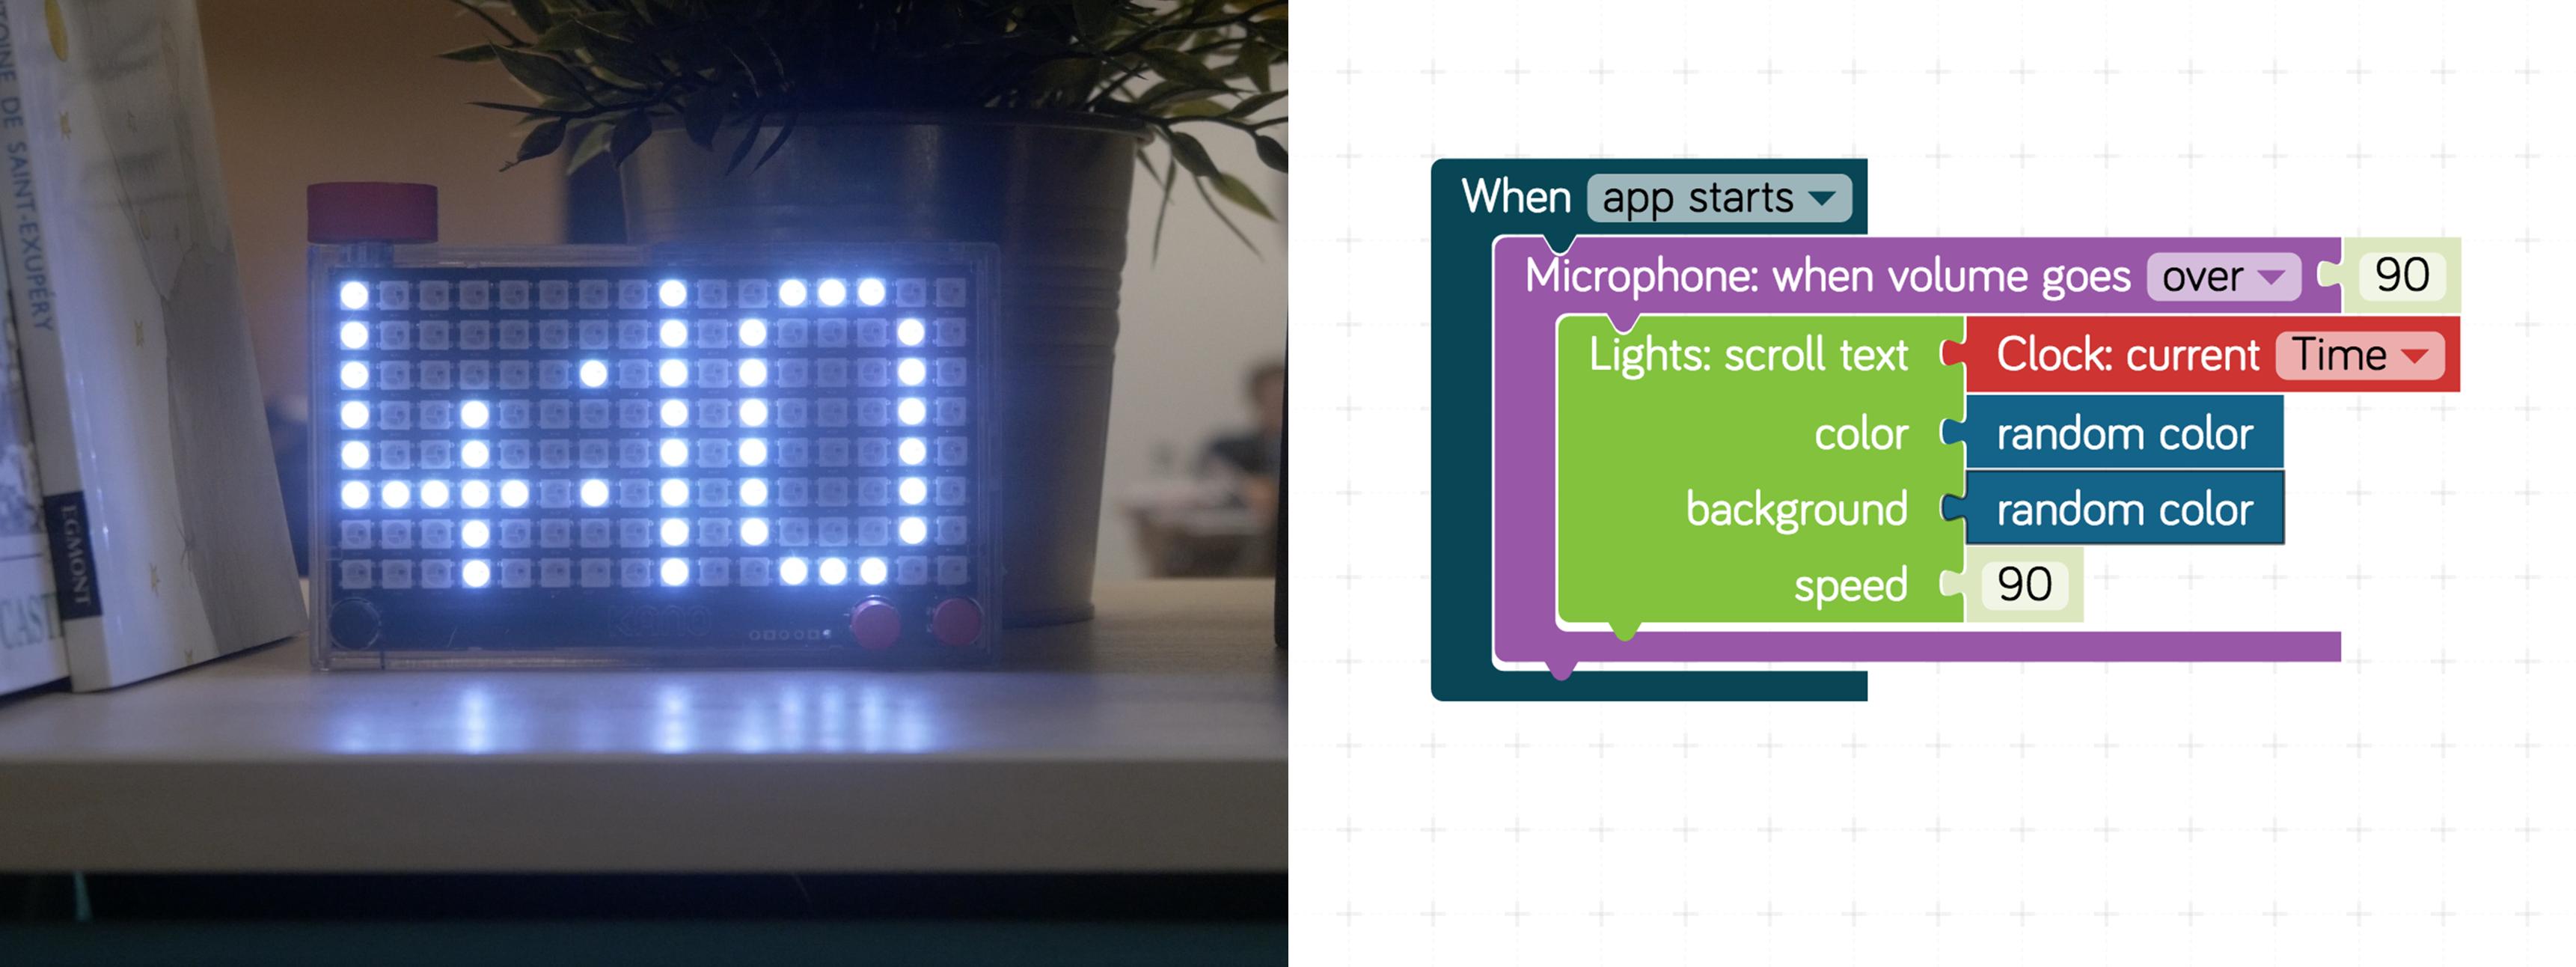 Kano's new motion sensor kit makes gesture control simple, fun